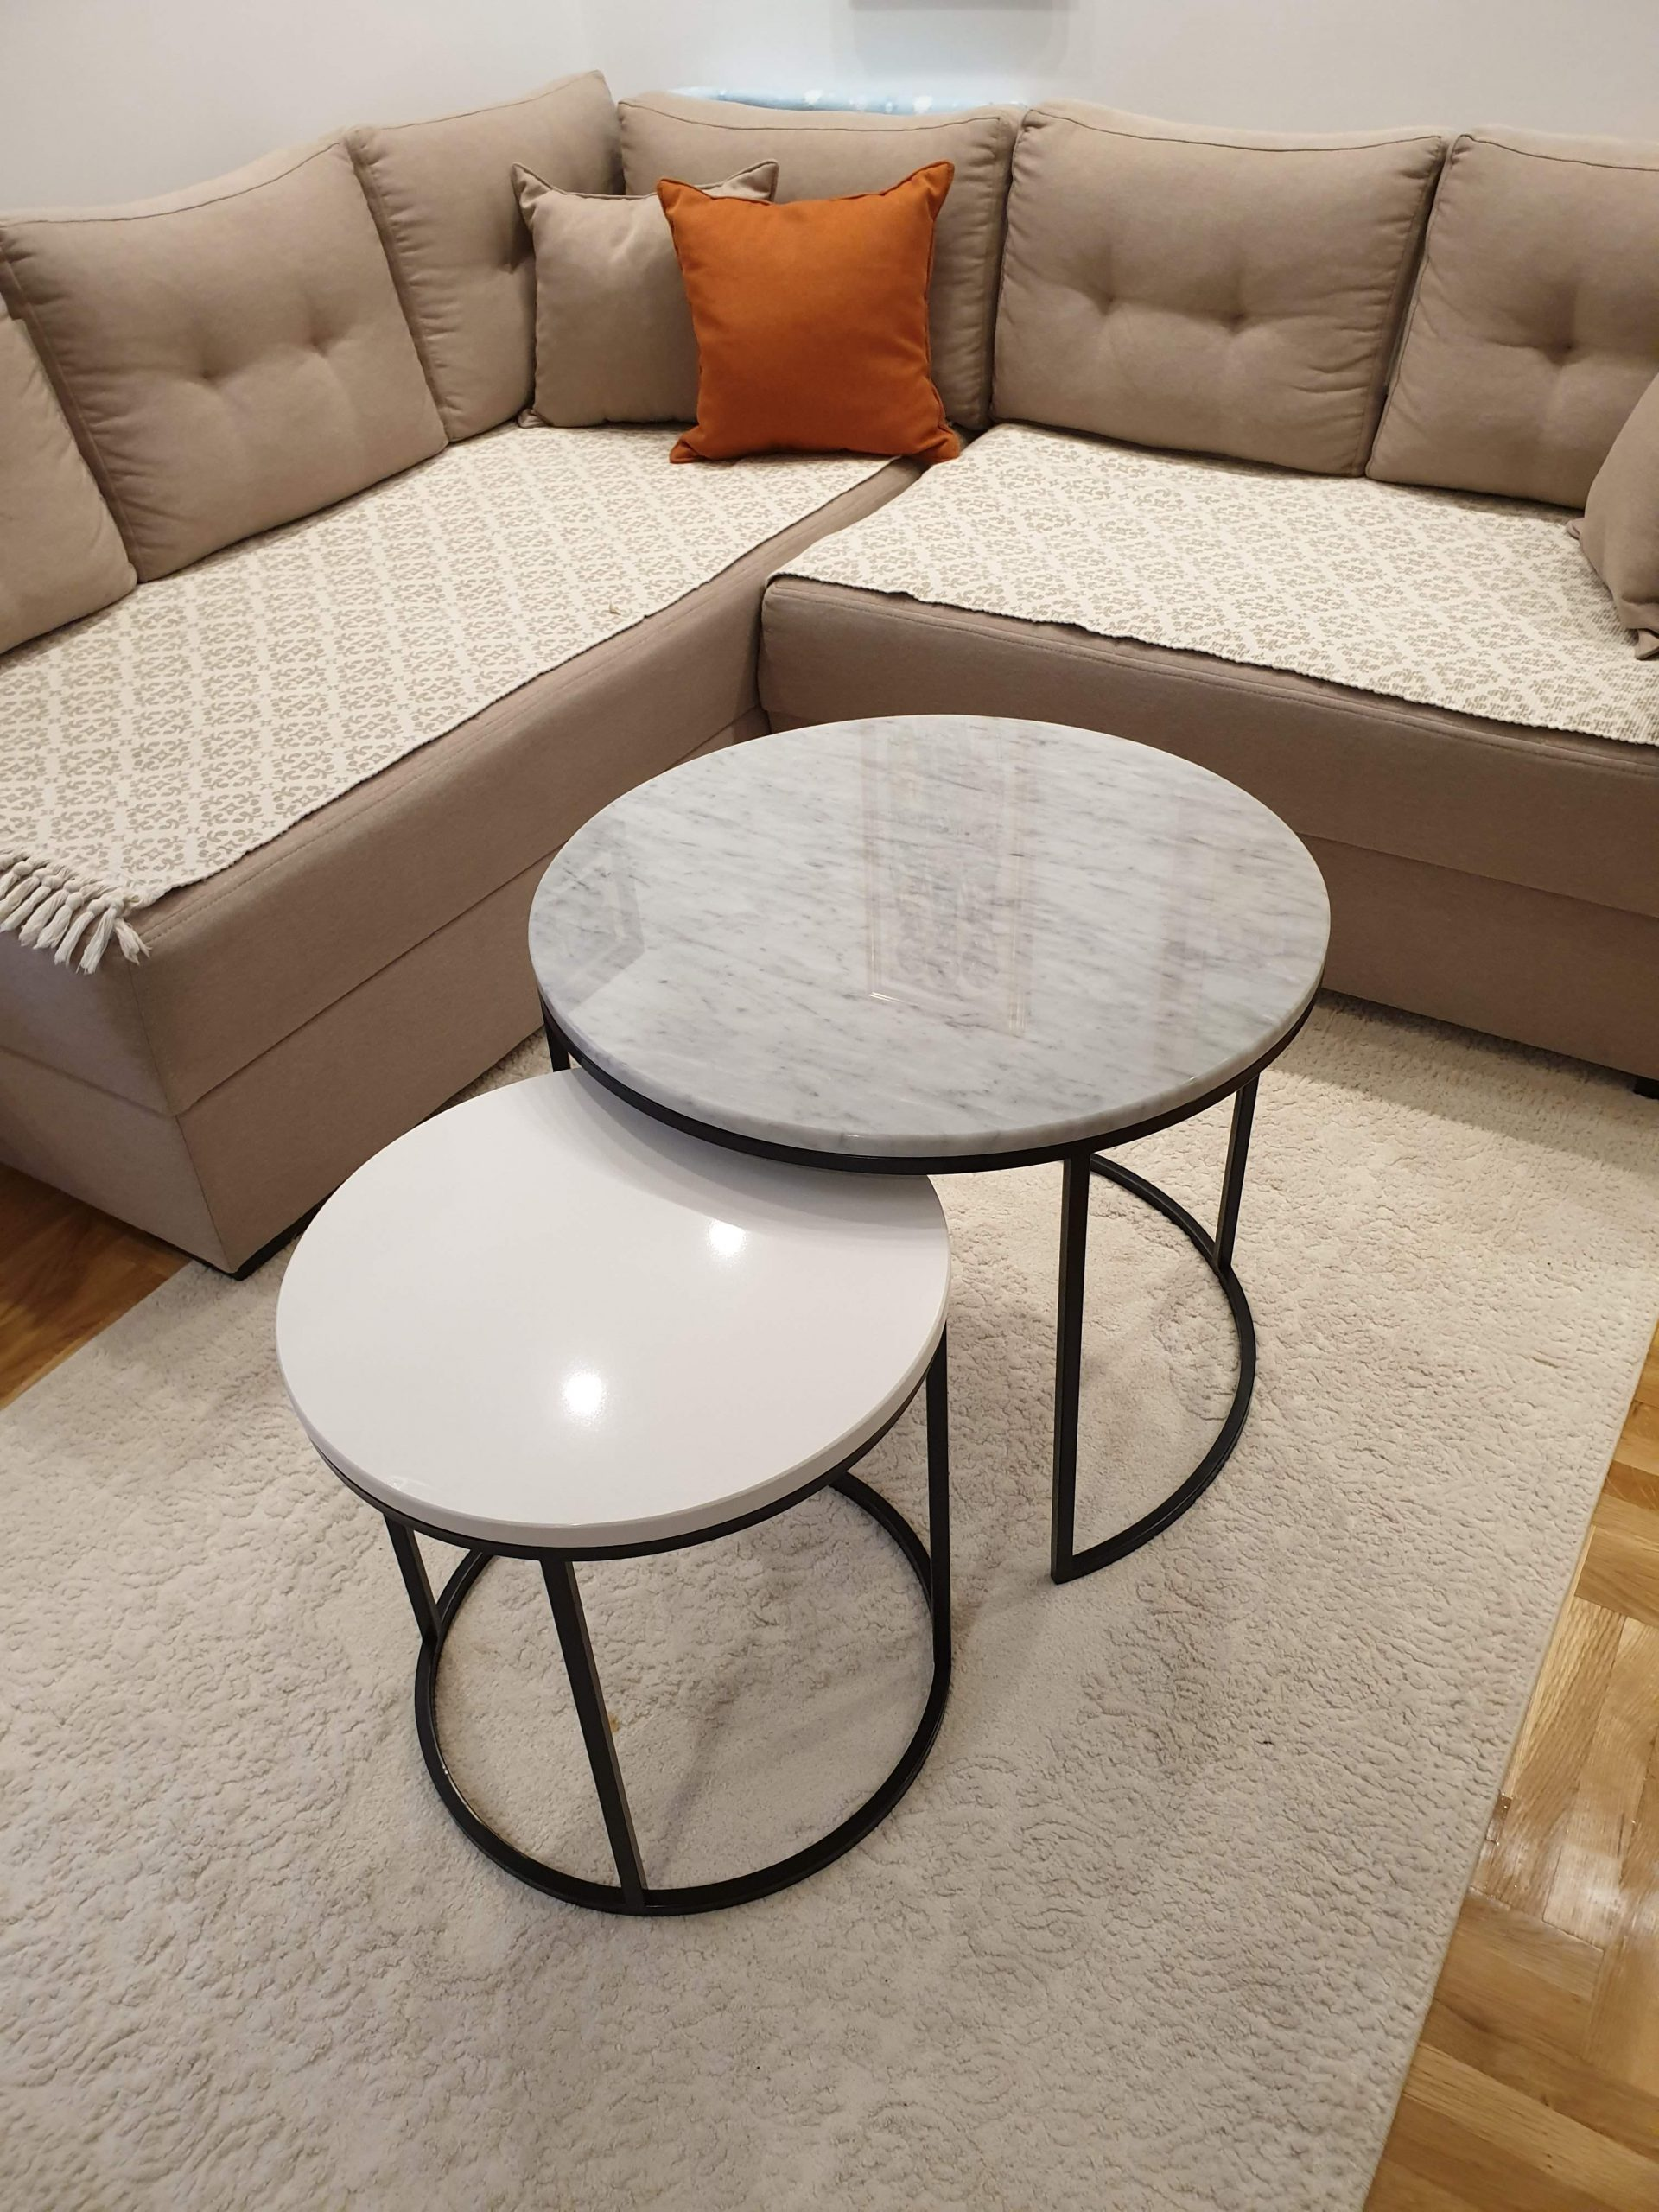 Beli klub stolovi od mermera i kvarca